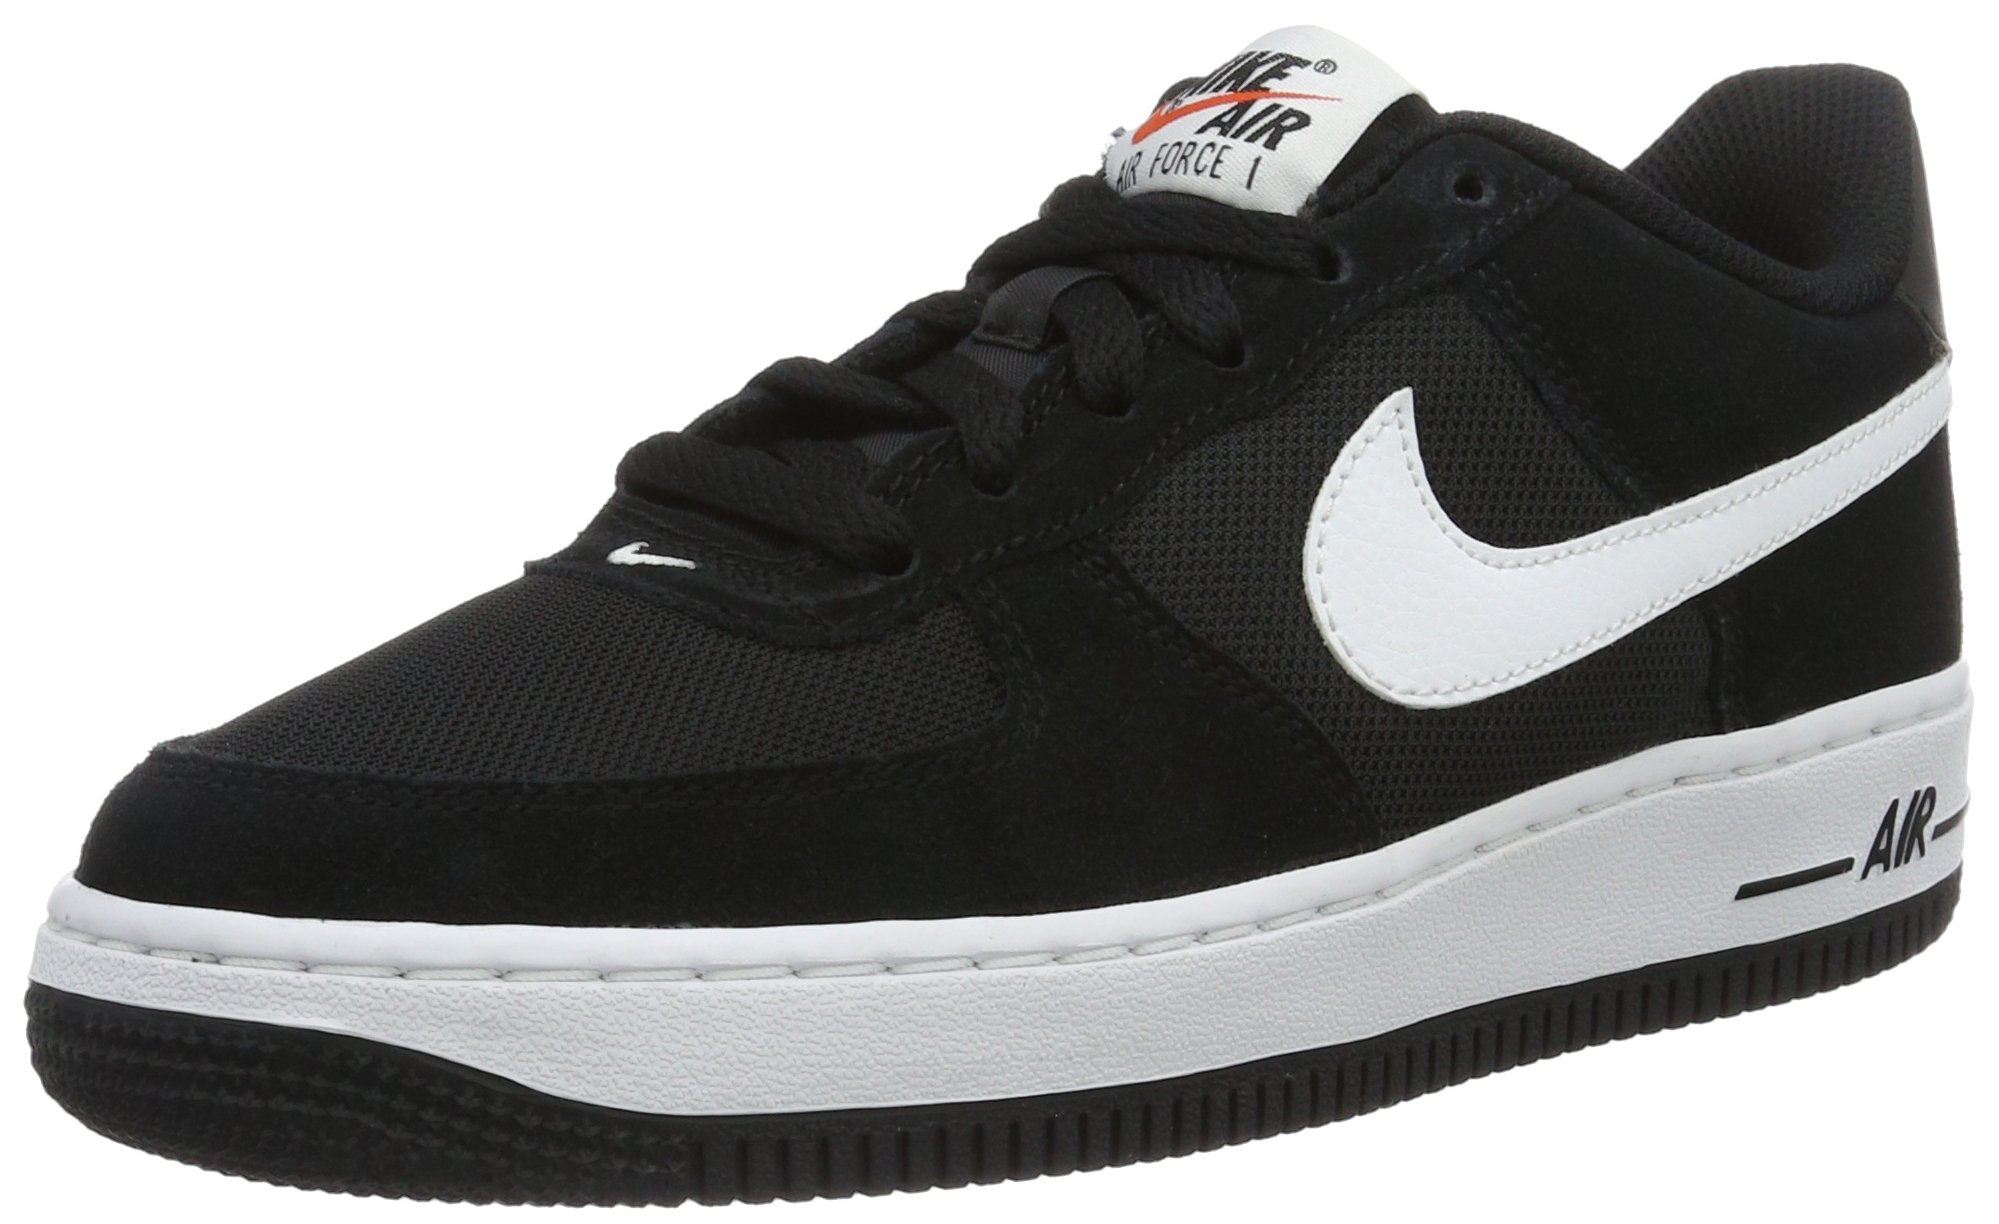 Nike Boy's Air Force 1 Low Basketball Sneaker (5 M US Big Kid) BlackWhite